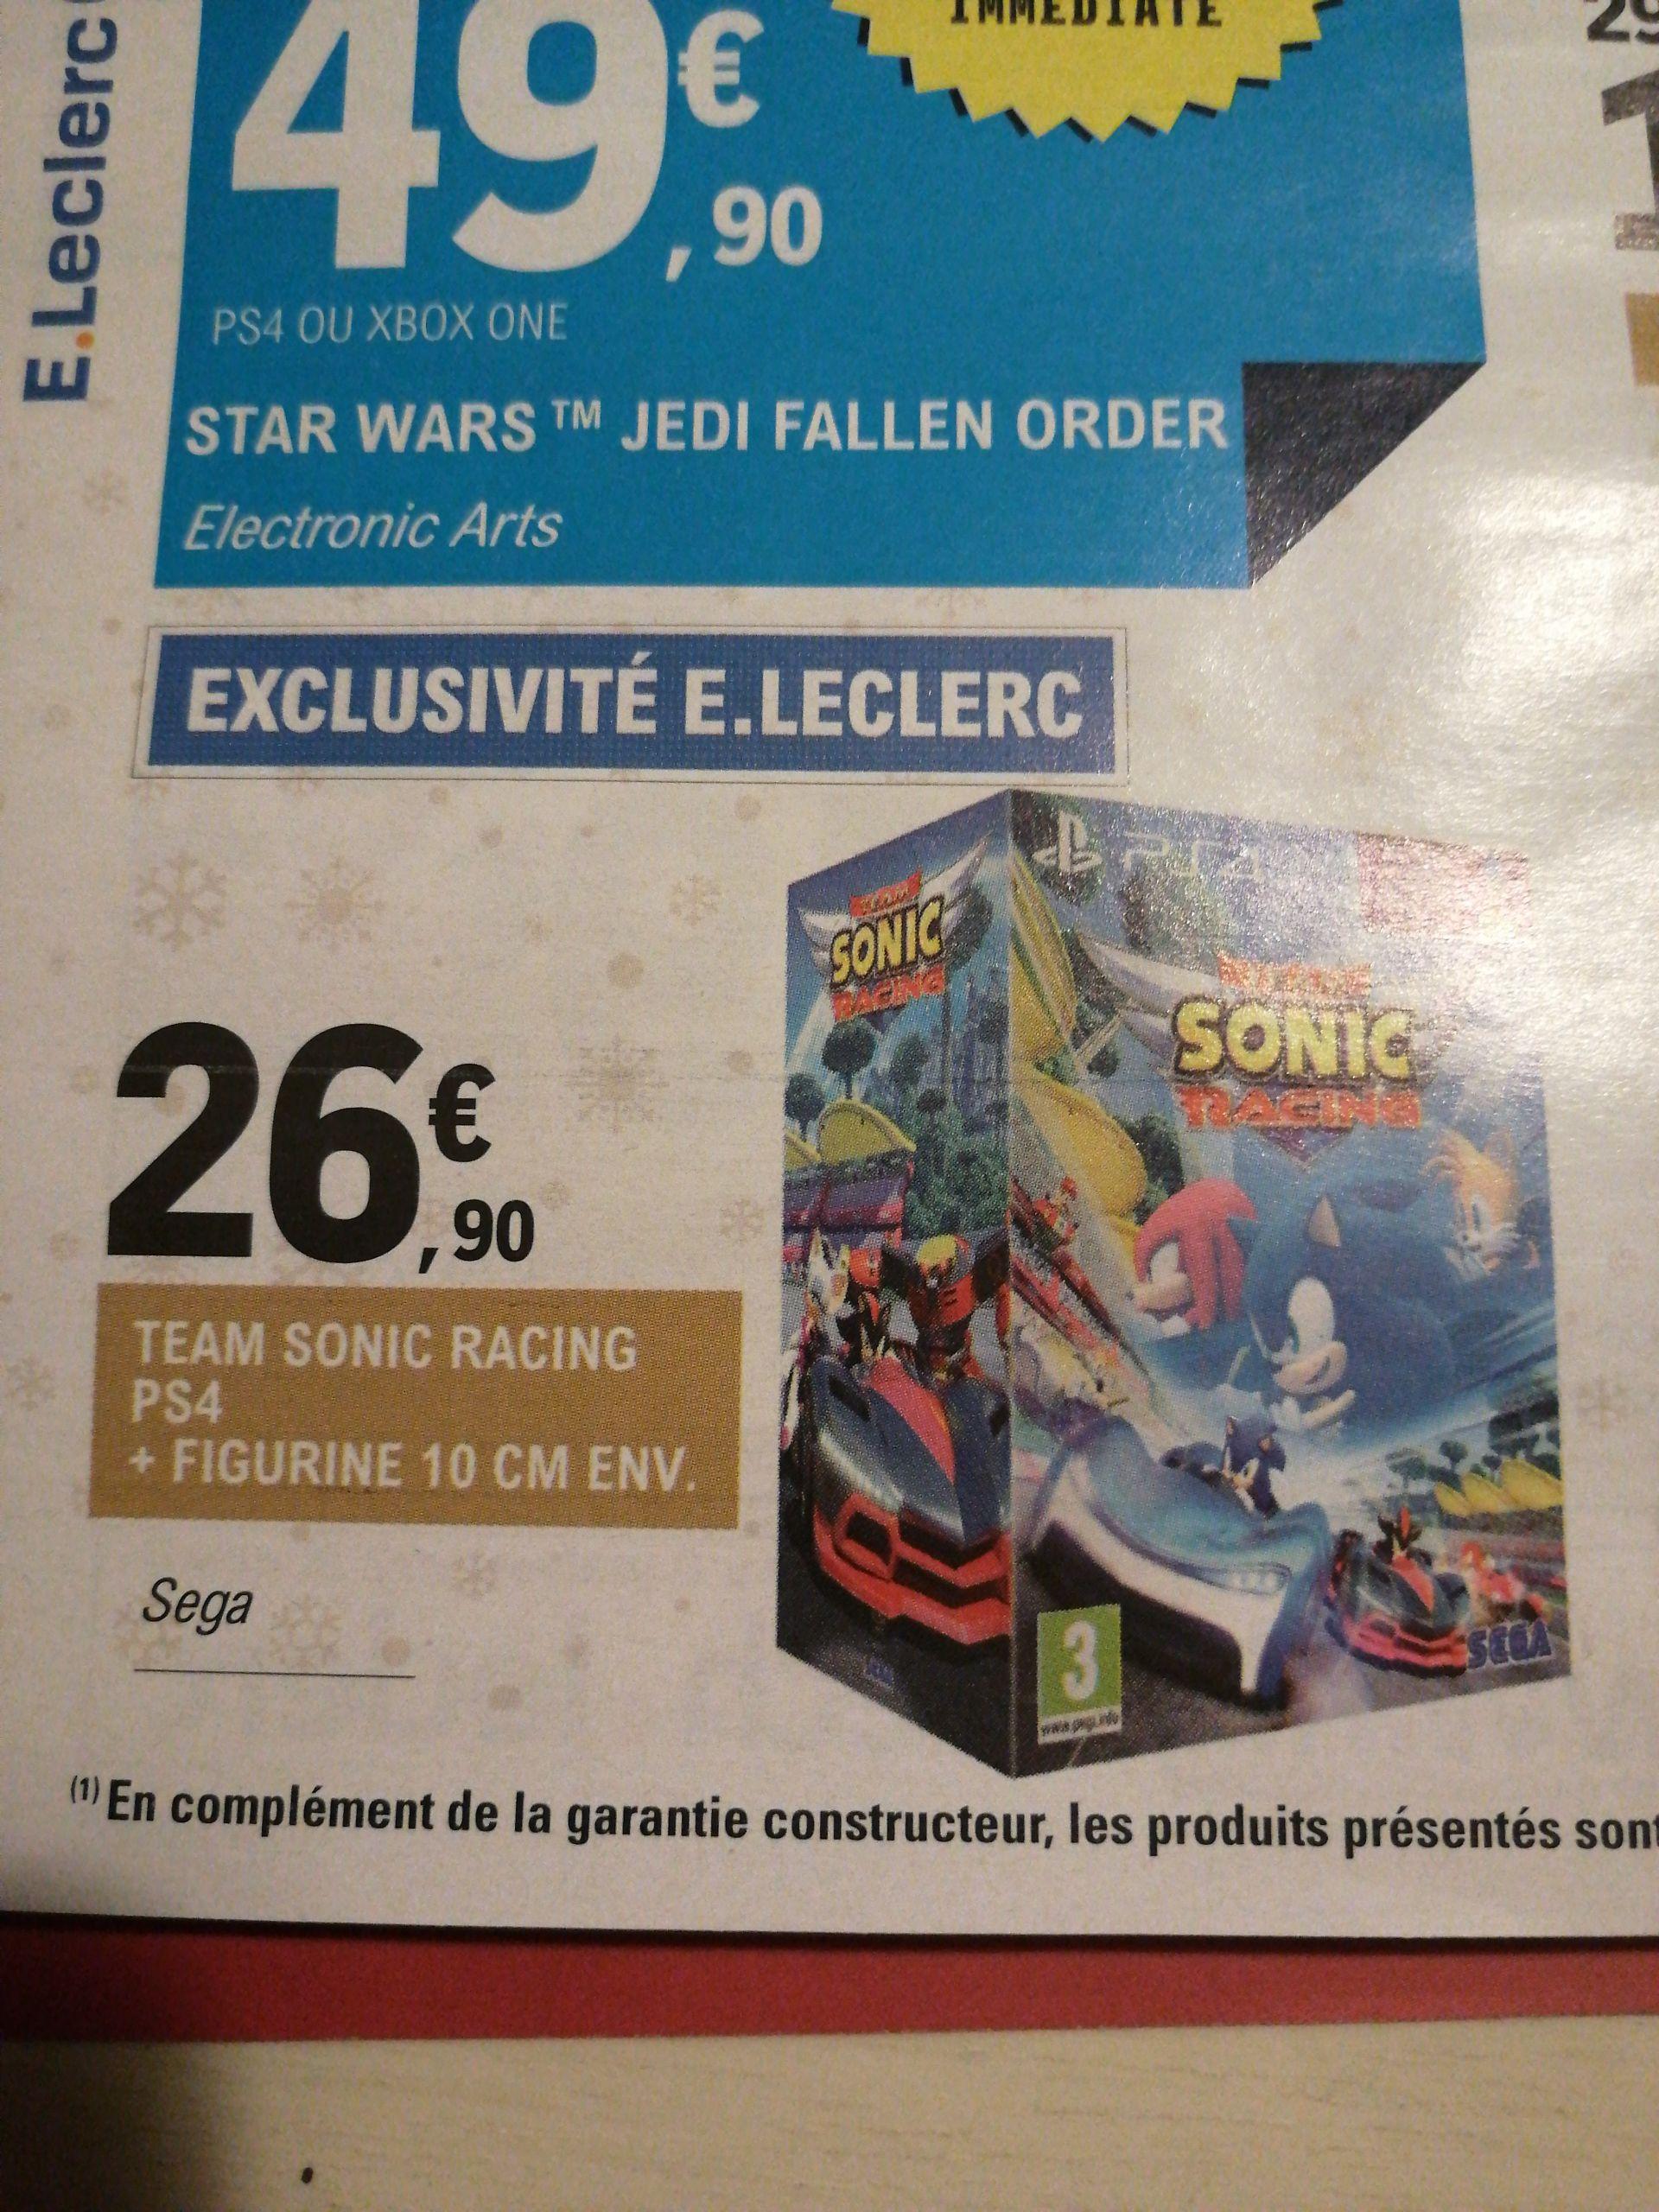 Team Sonic Racing sur PS4 + figurine (10 cm)